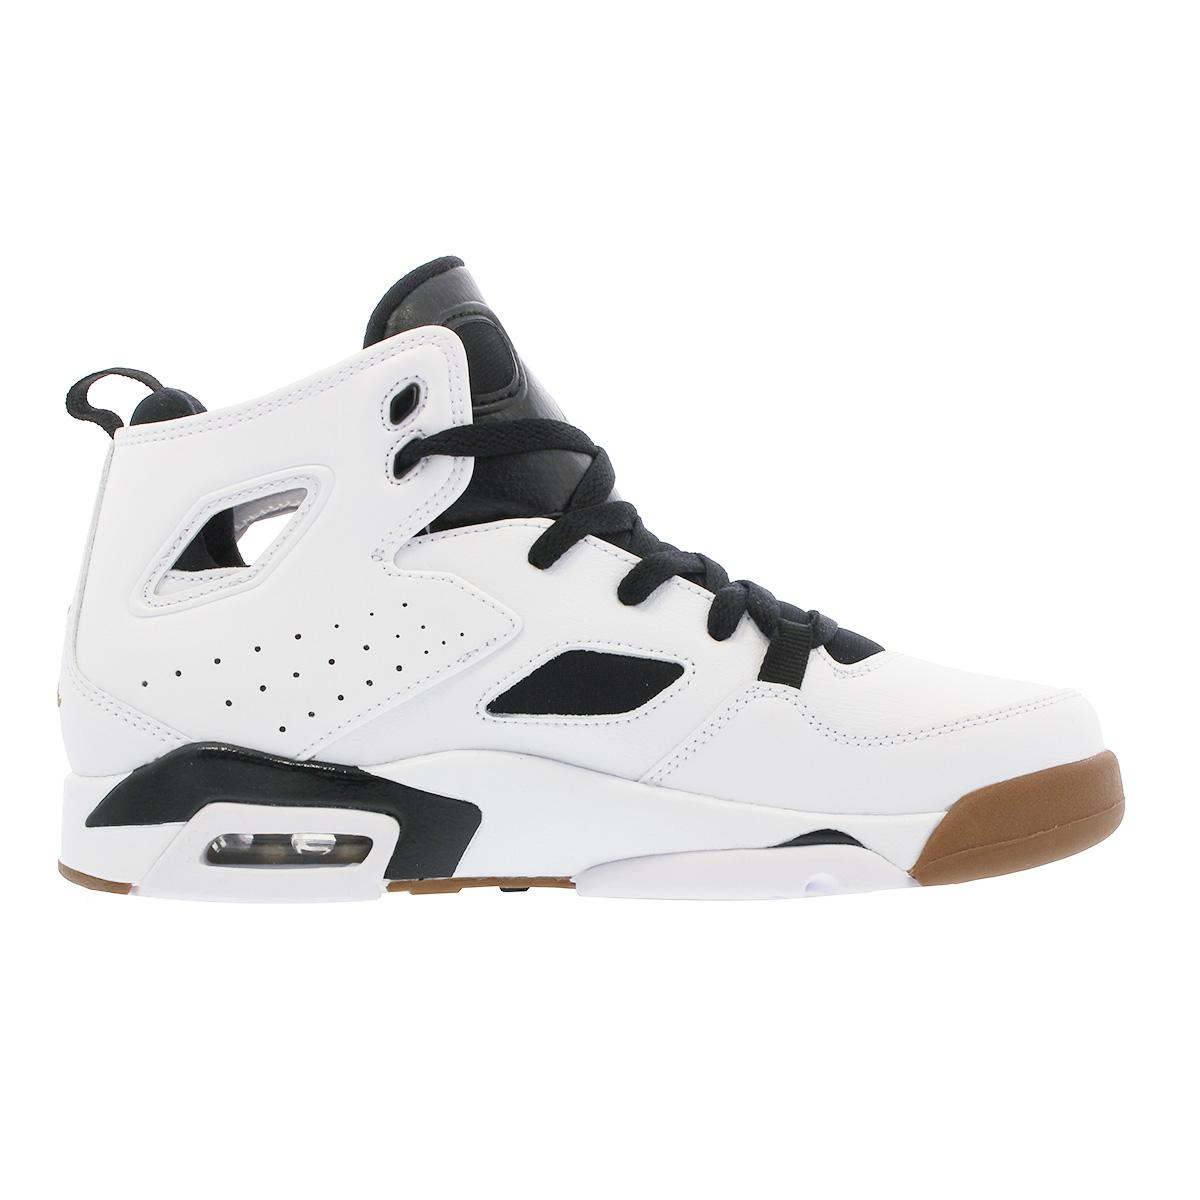 NIKE JORDAN FLIGHT CLUB 91 GG Nike Jordan flight club 91 GG  WHITE BLACK GOLD 555 7091629c5010